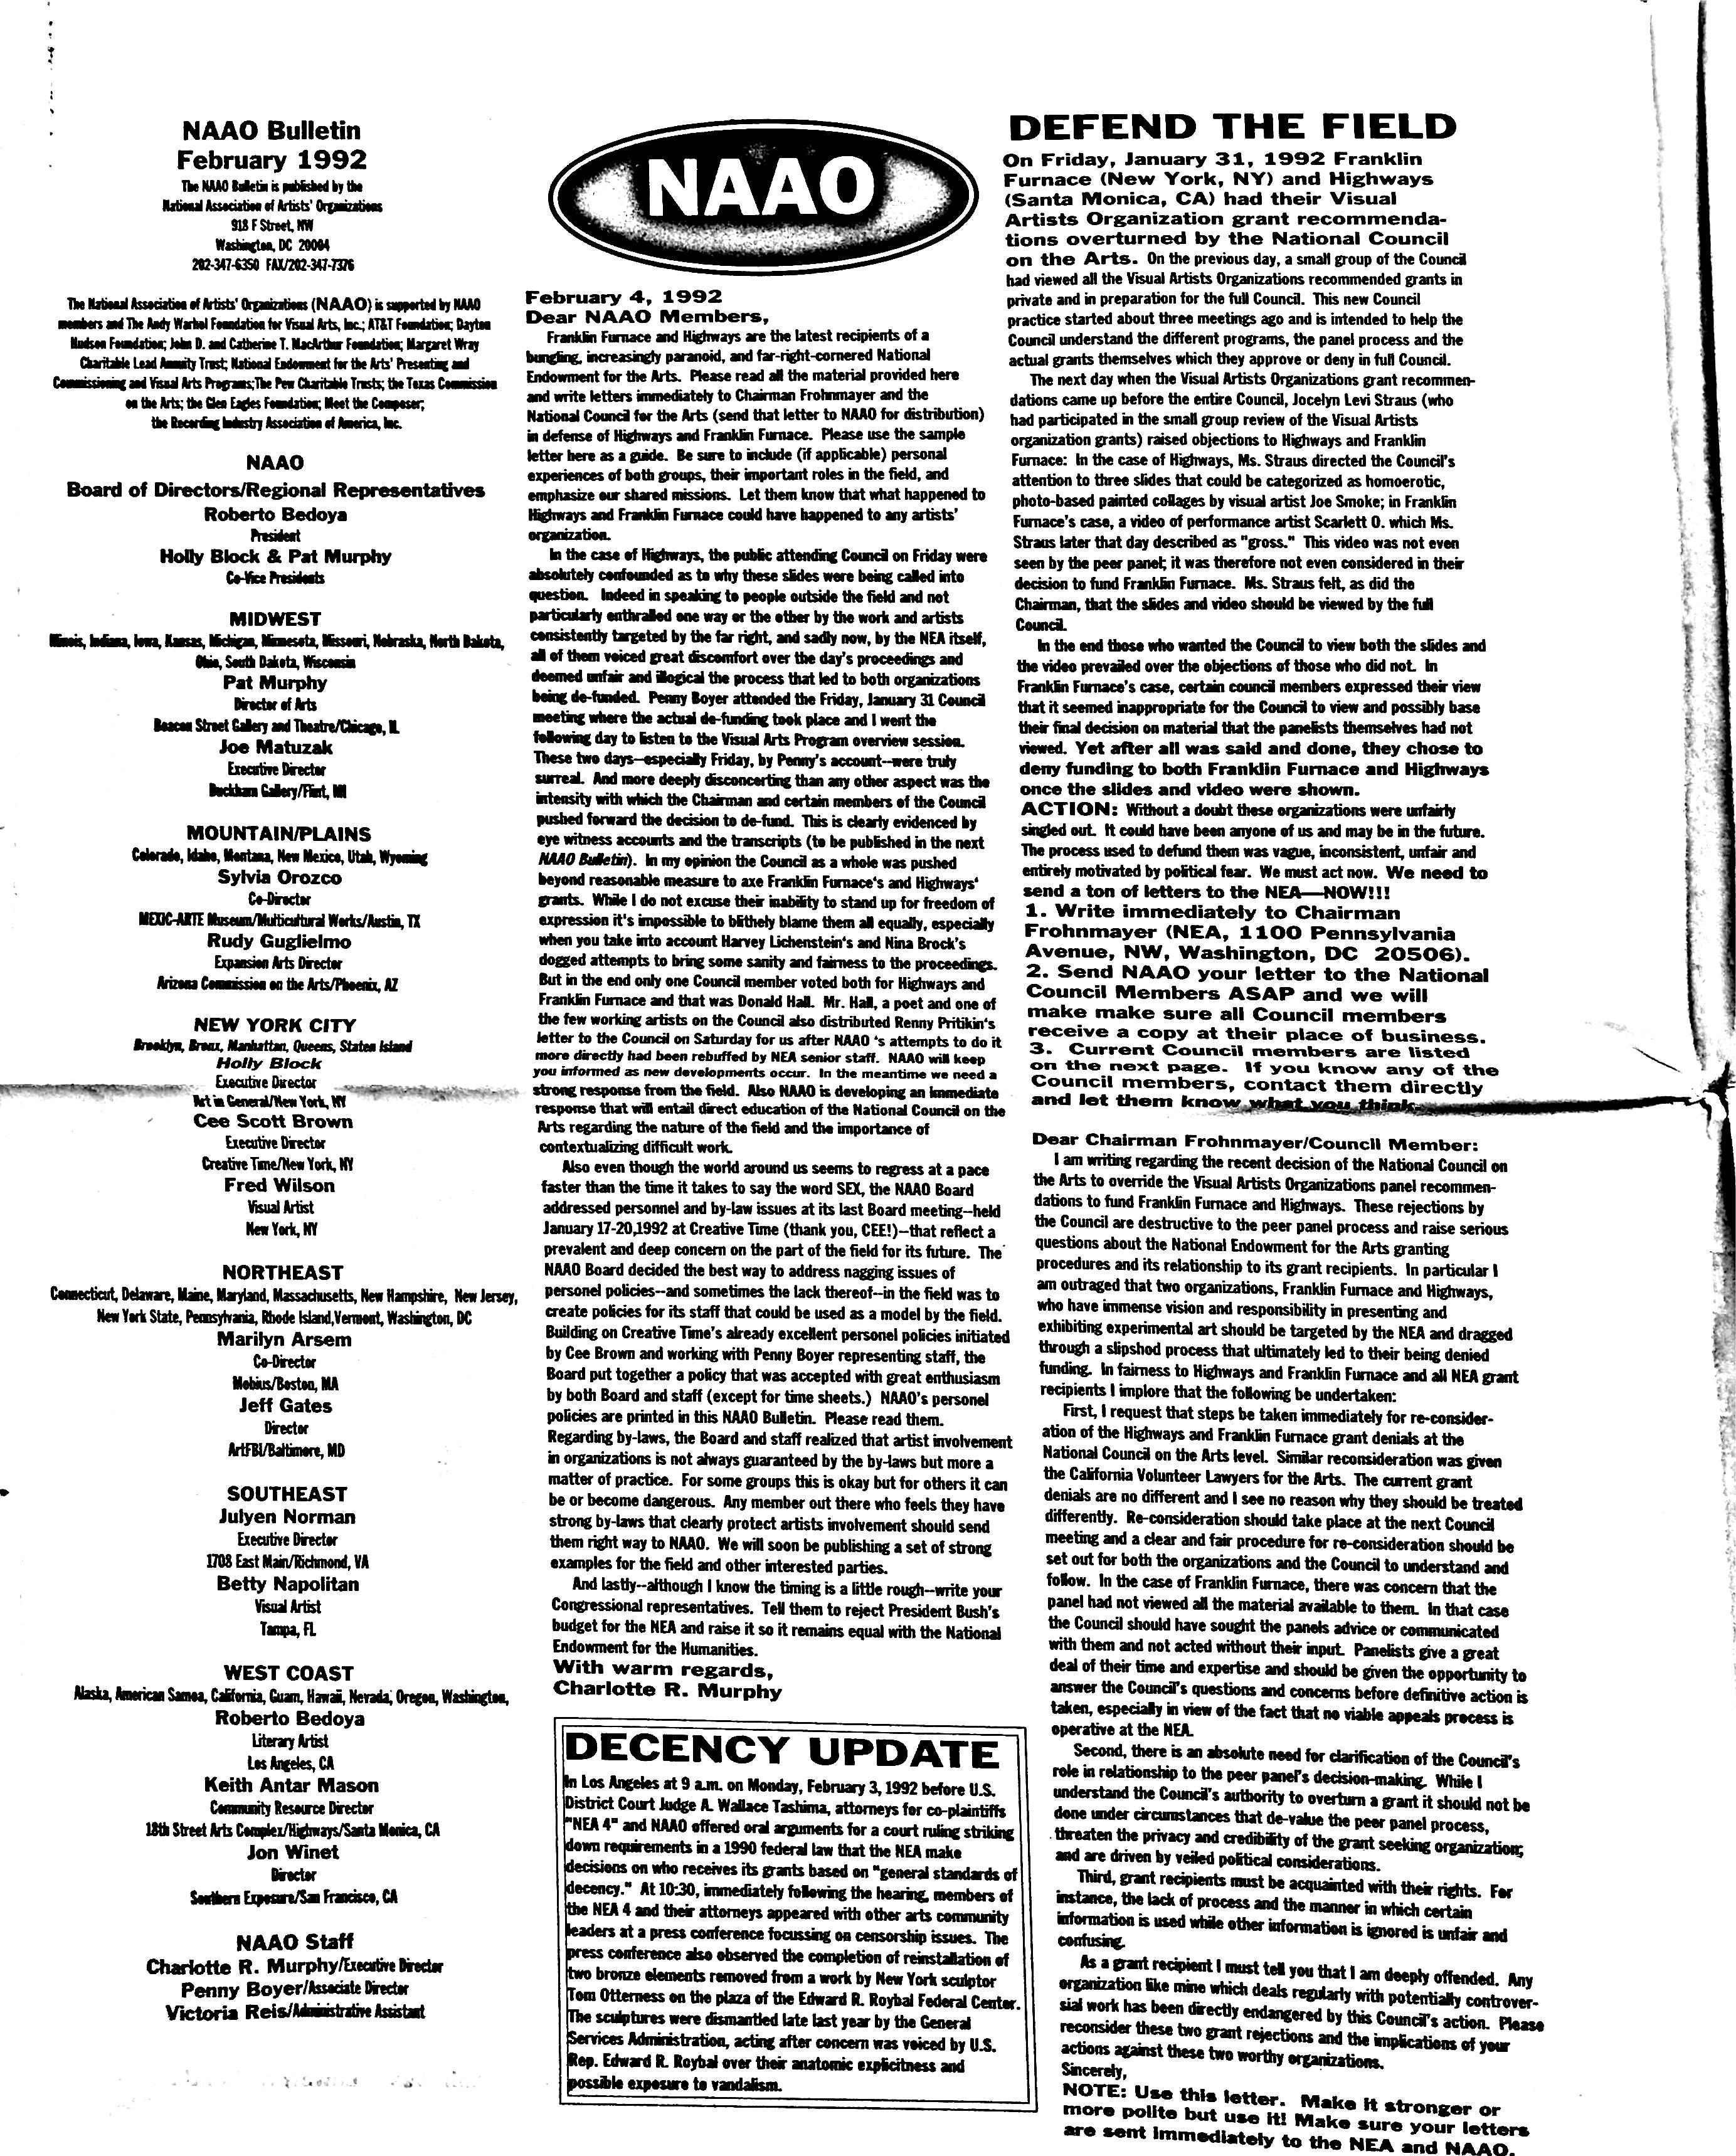 February 1992 - NAAO Bulletin Page 2.jpg